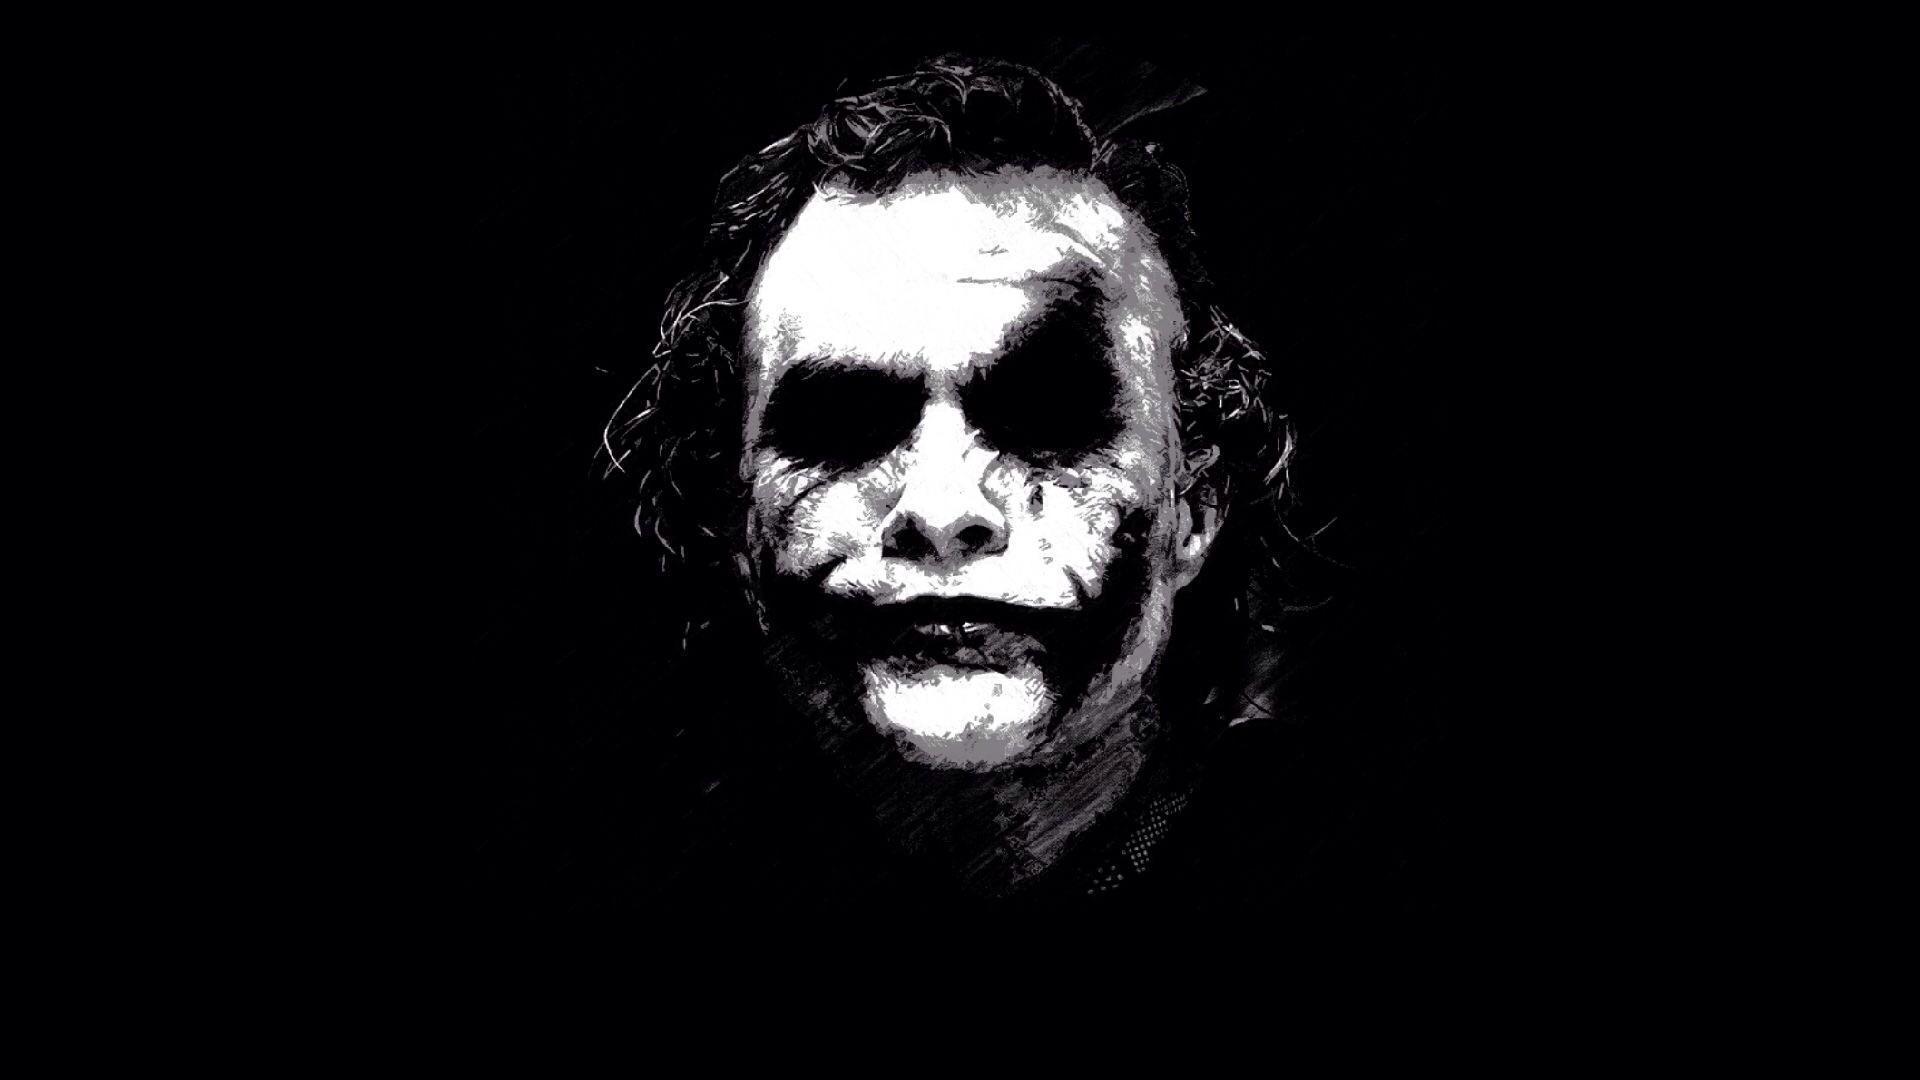 Black Joker Wallpapers - Wallpaper Cave